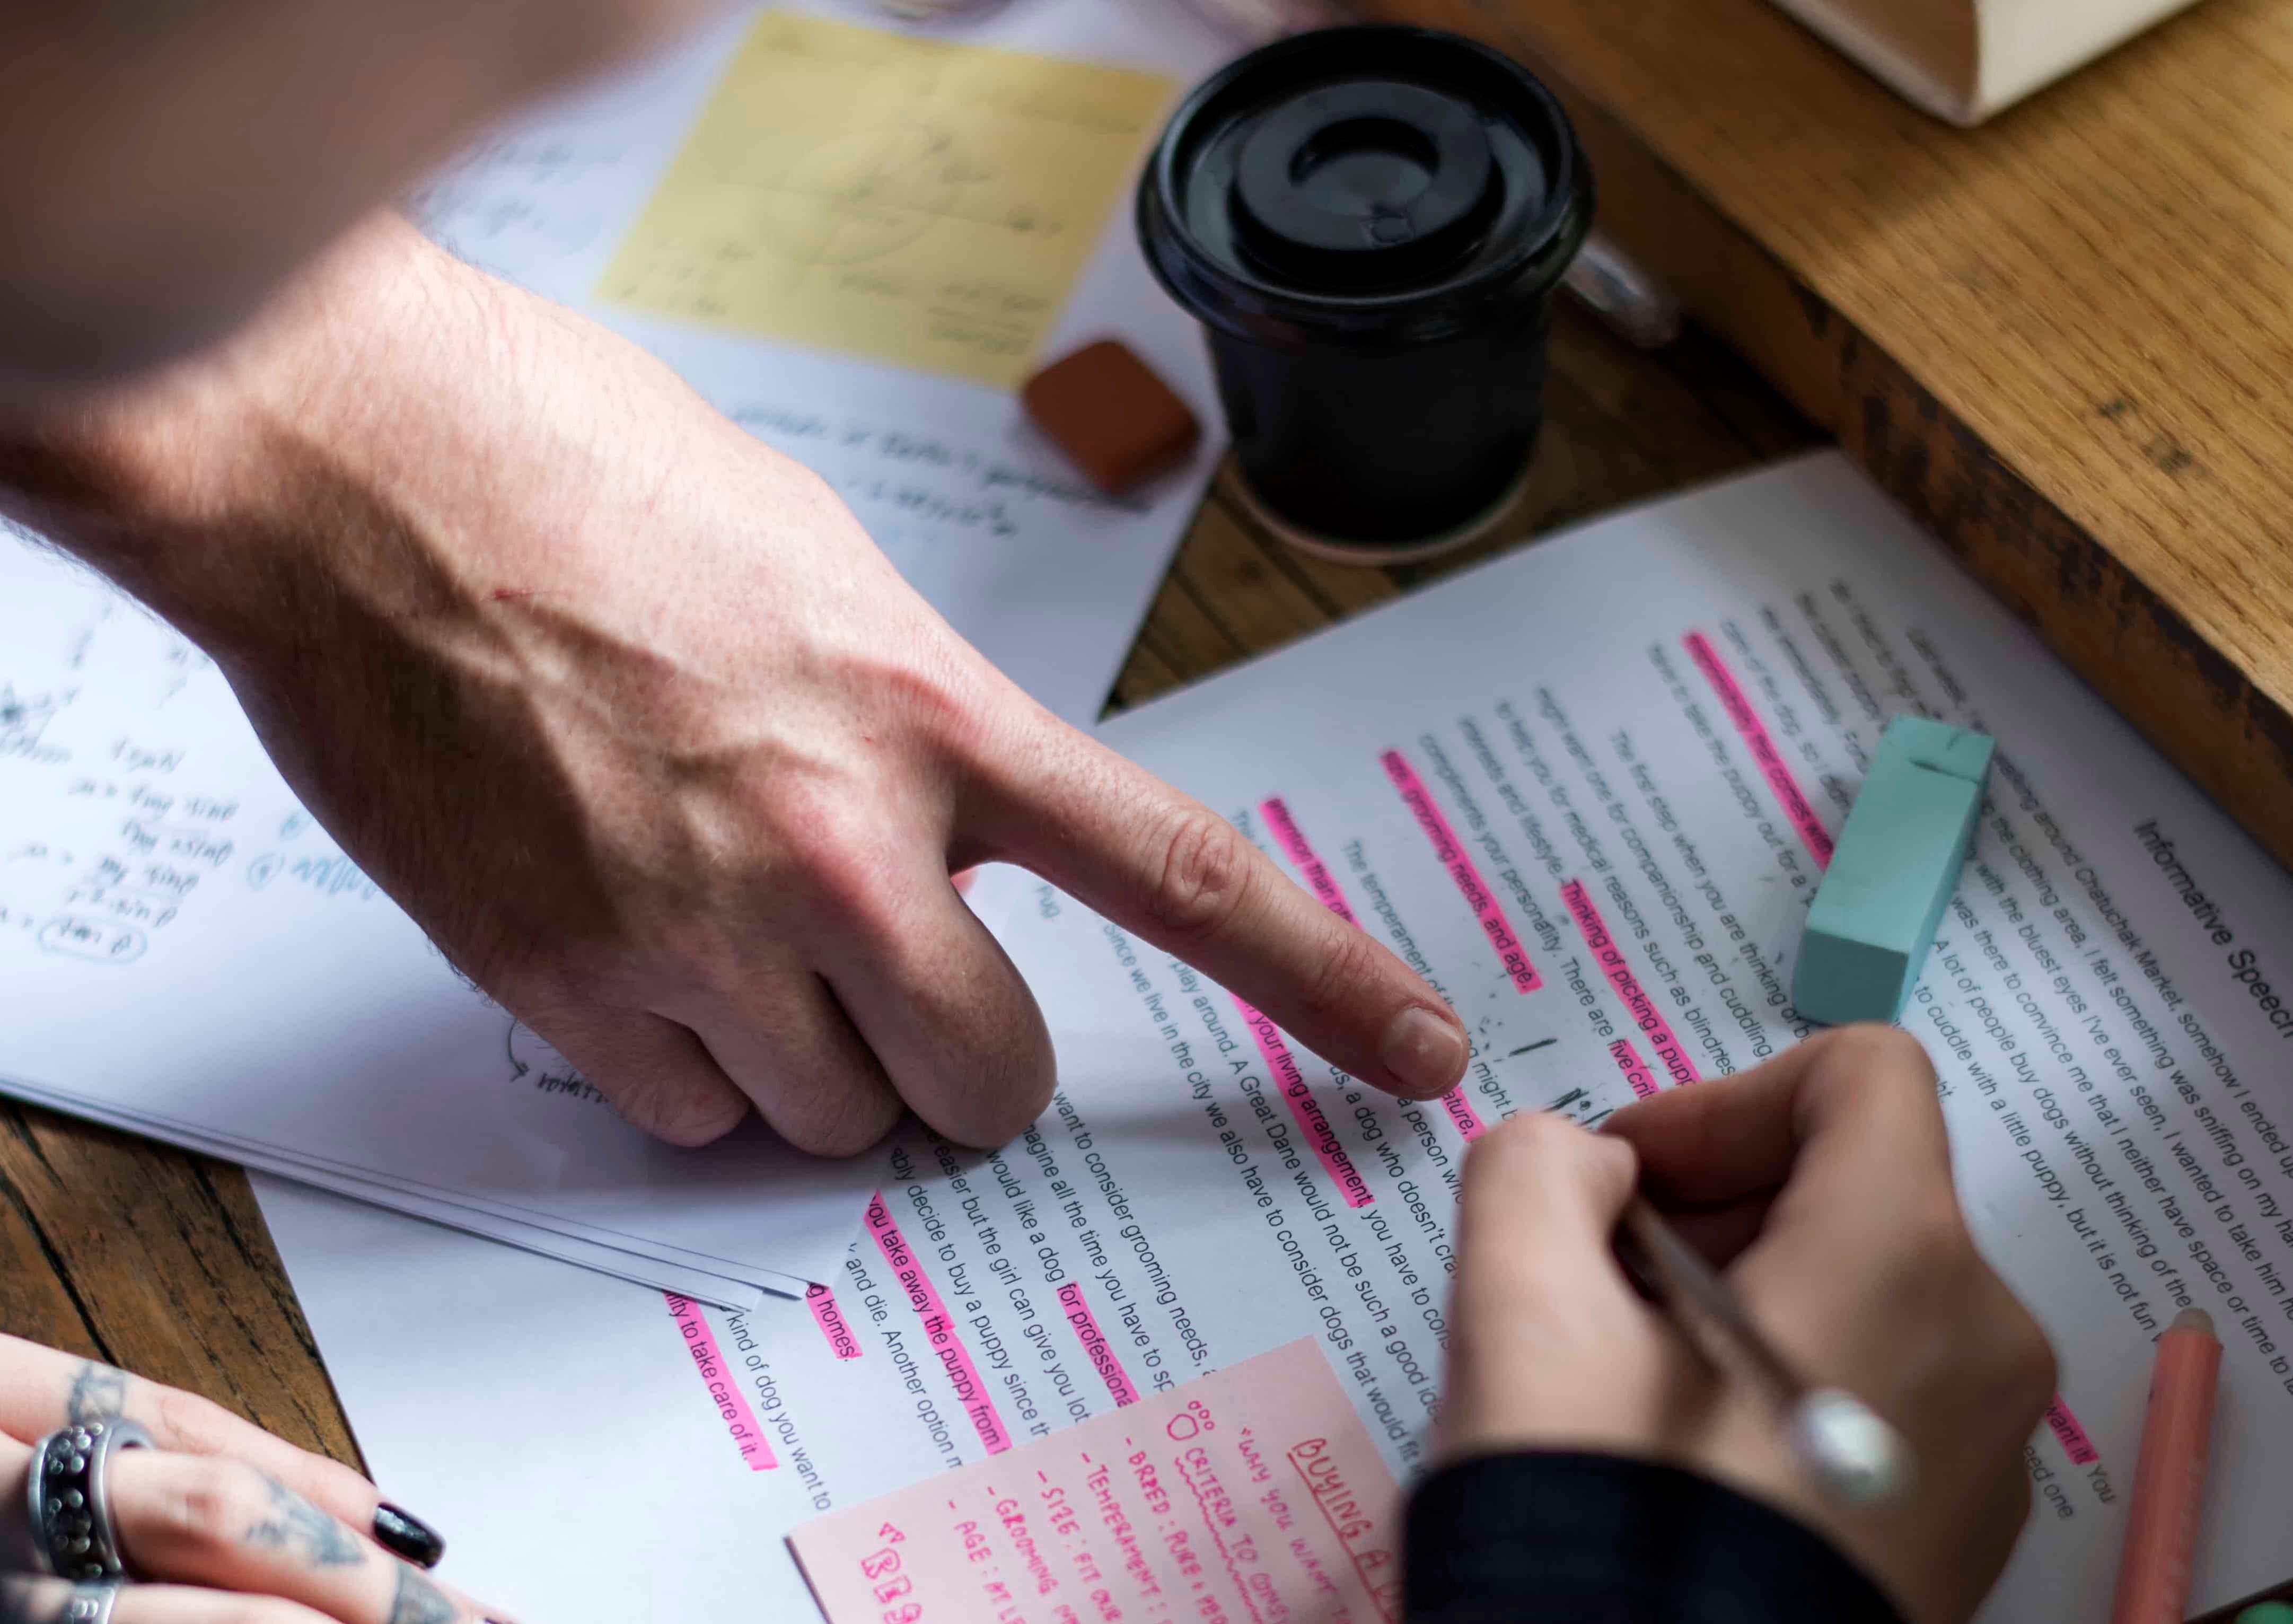 editor-proofreading-document